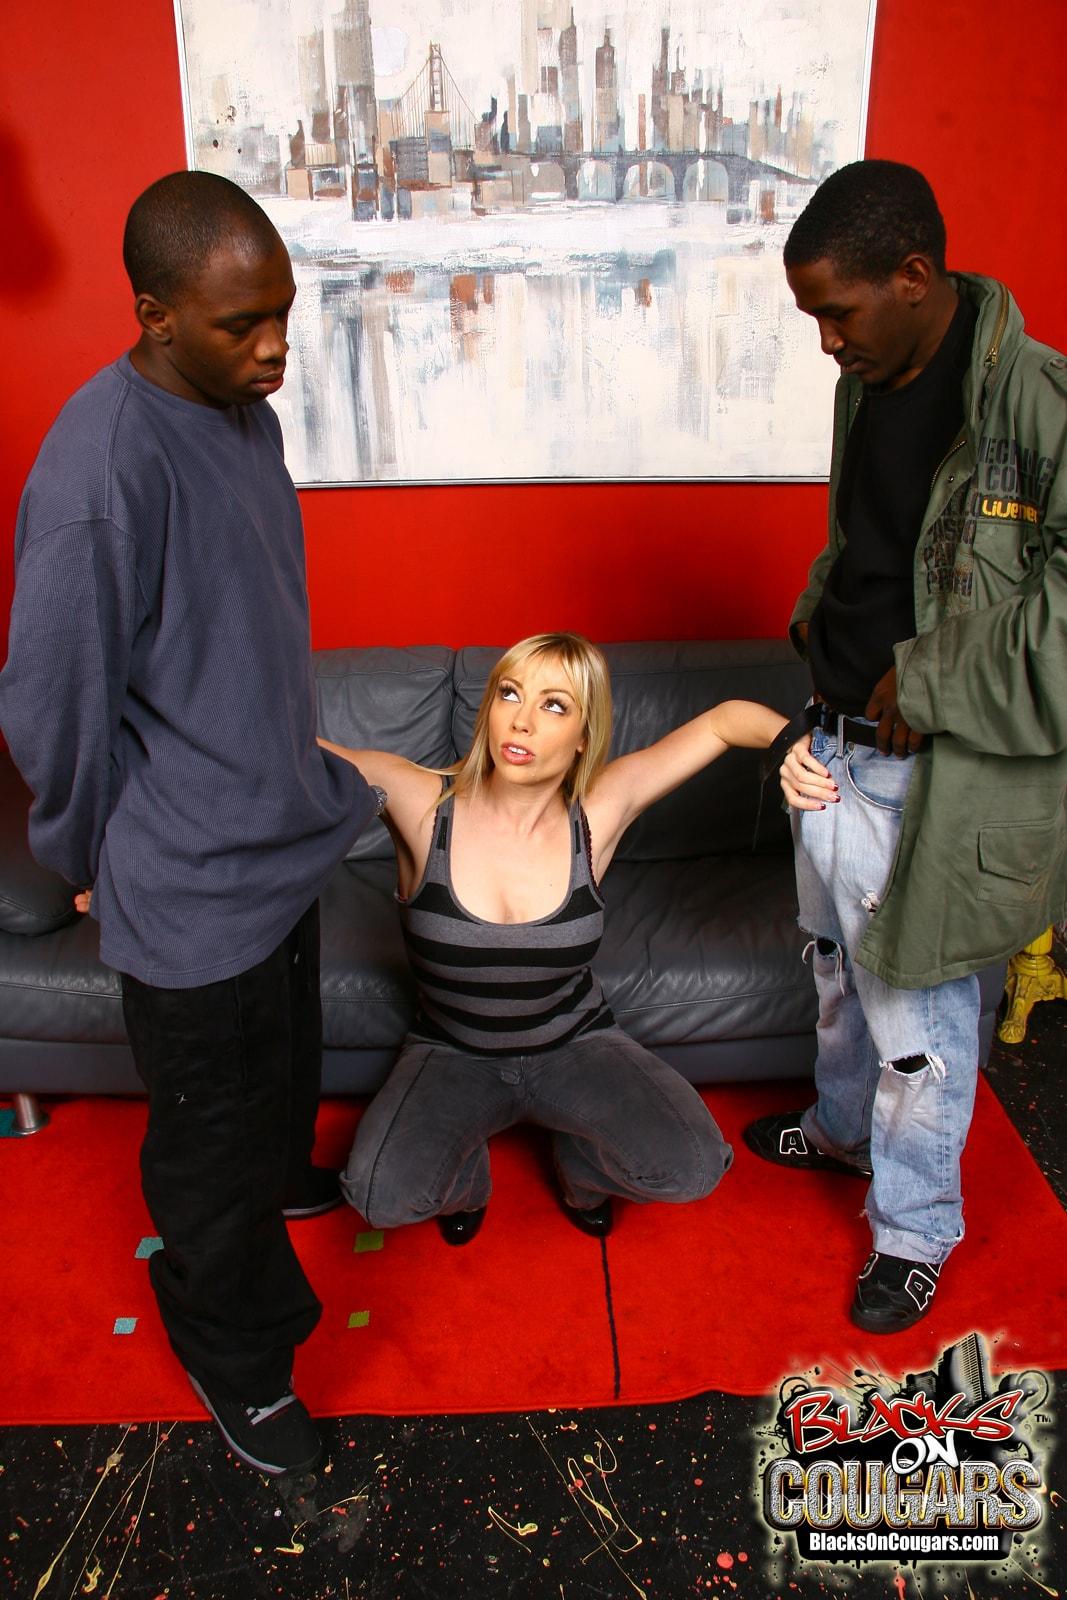 Dogfart '- Blacks On Cougars' starring Adrianna Nicole (Photo 5)